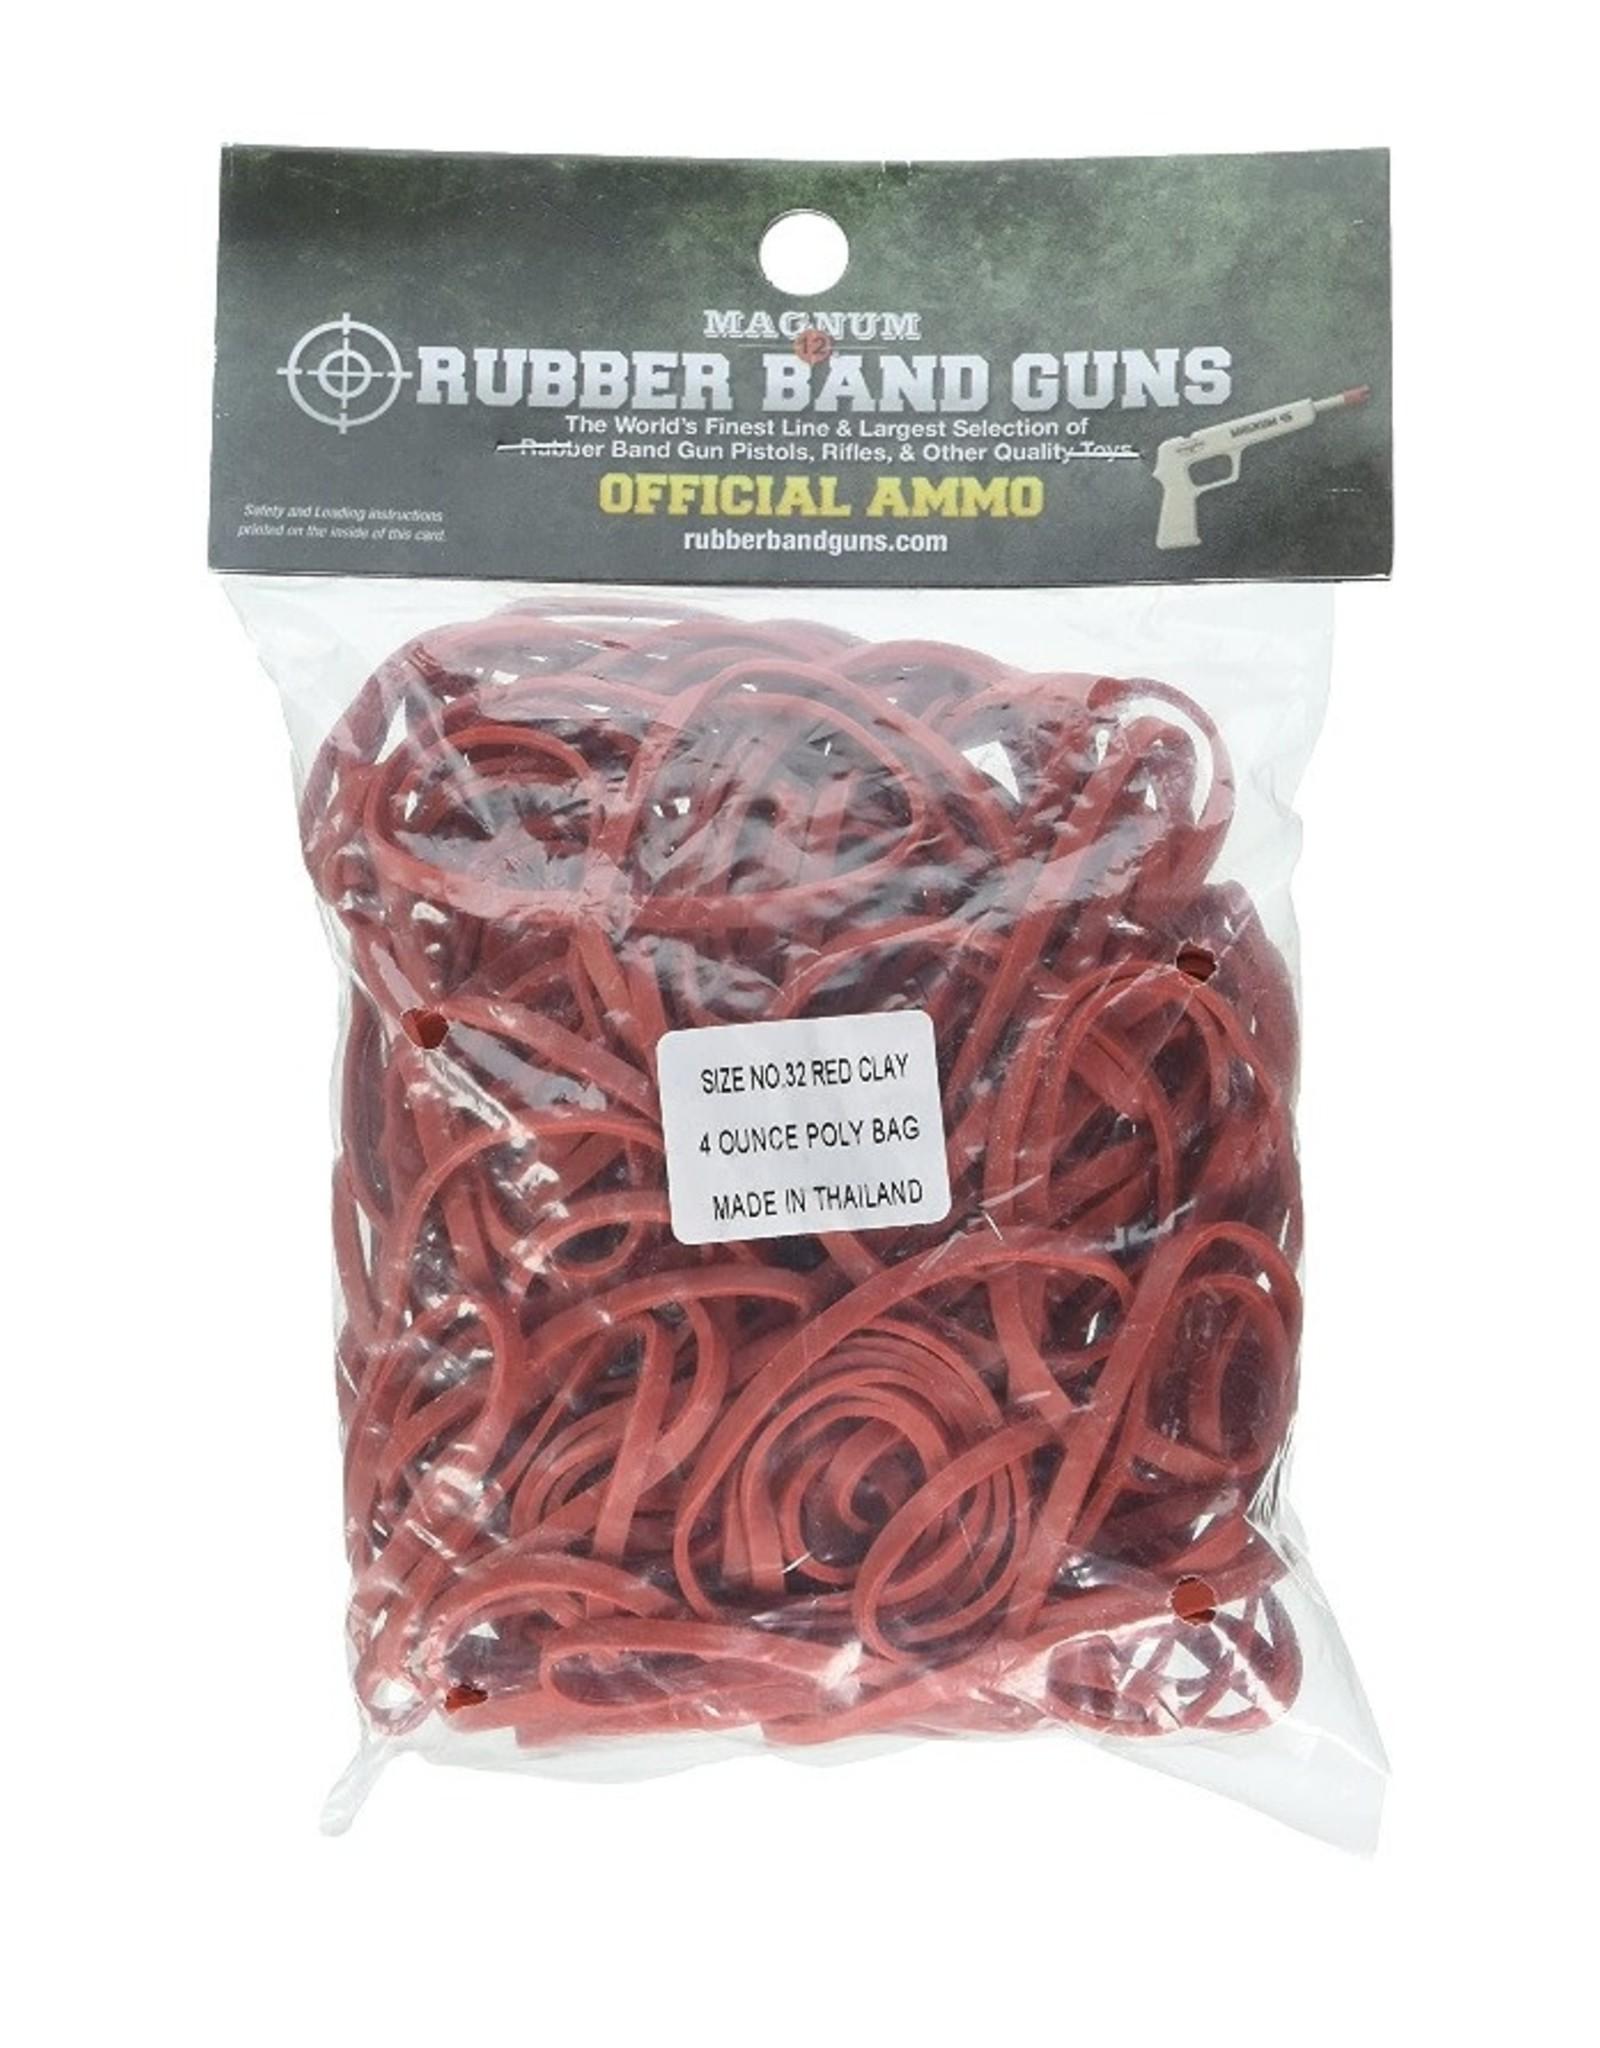 Pistol Ammo-Red (size 32, 4-oz. bag) - Ammo Size 32